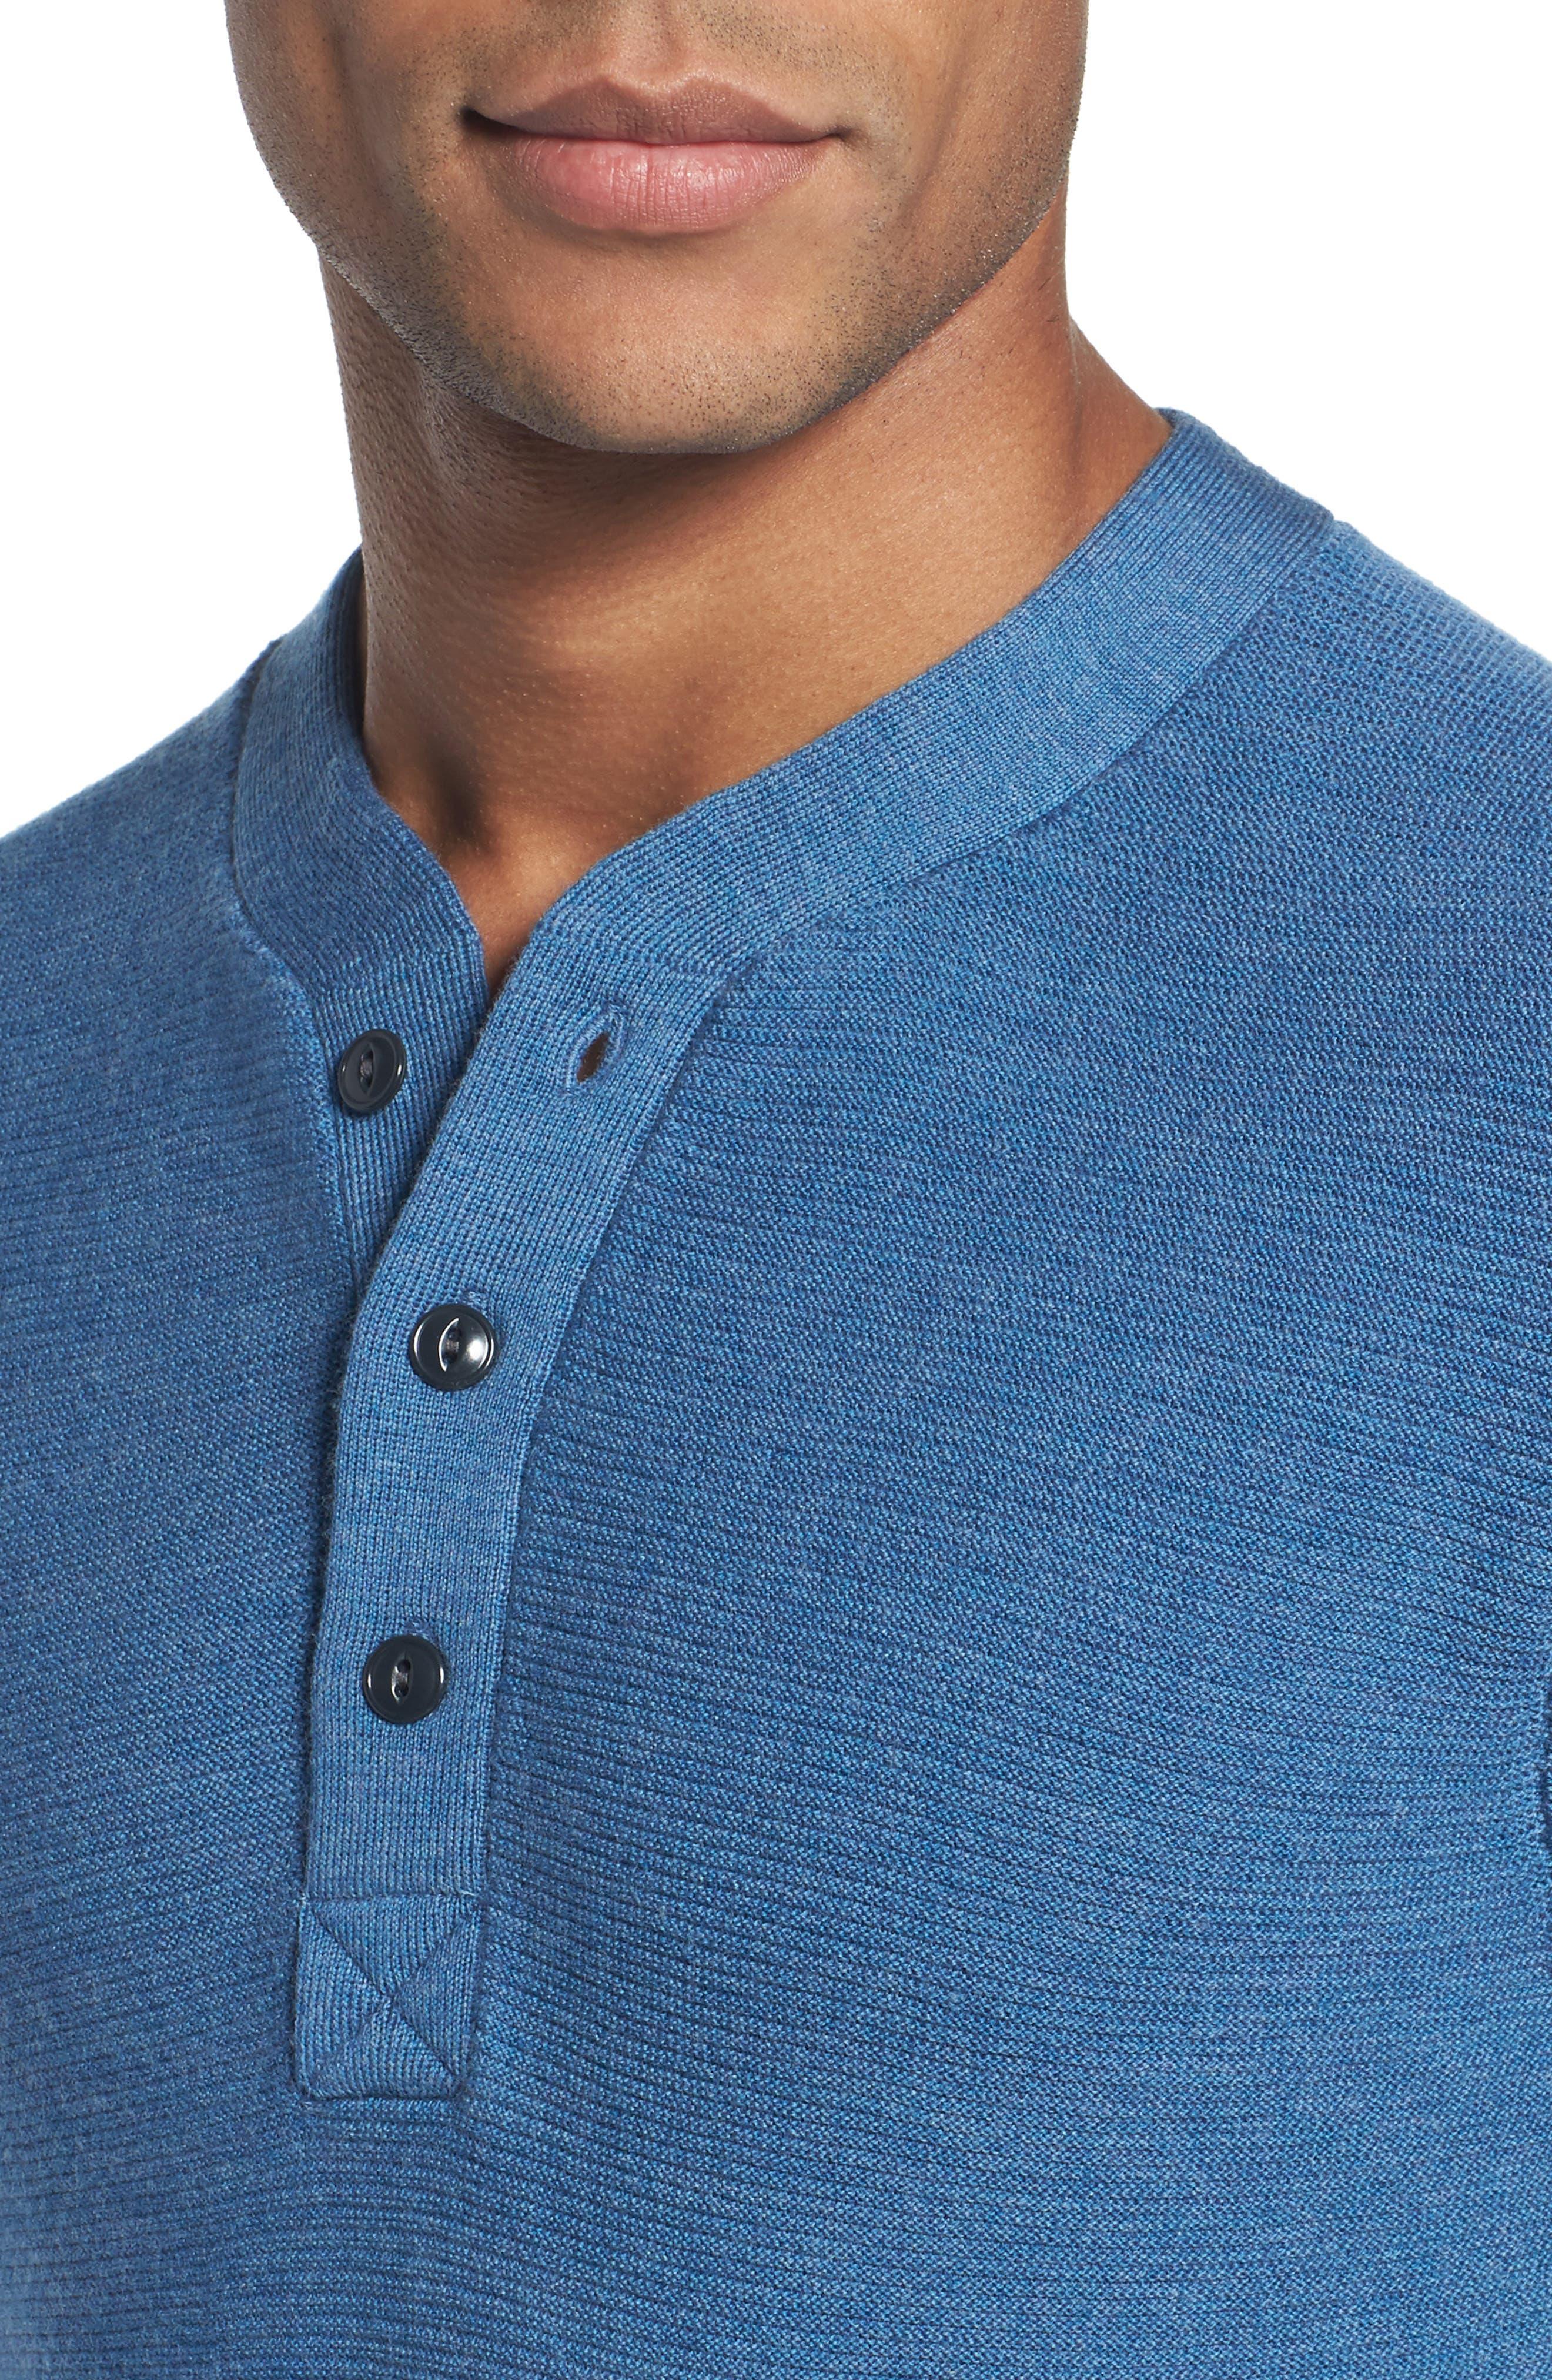 Slim Fit Merino Long Sleeve Henley Sweater,                             Alternate thumbnail 4, color,                             Heather Blue